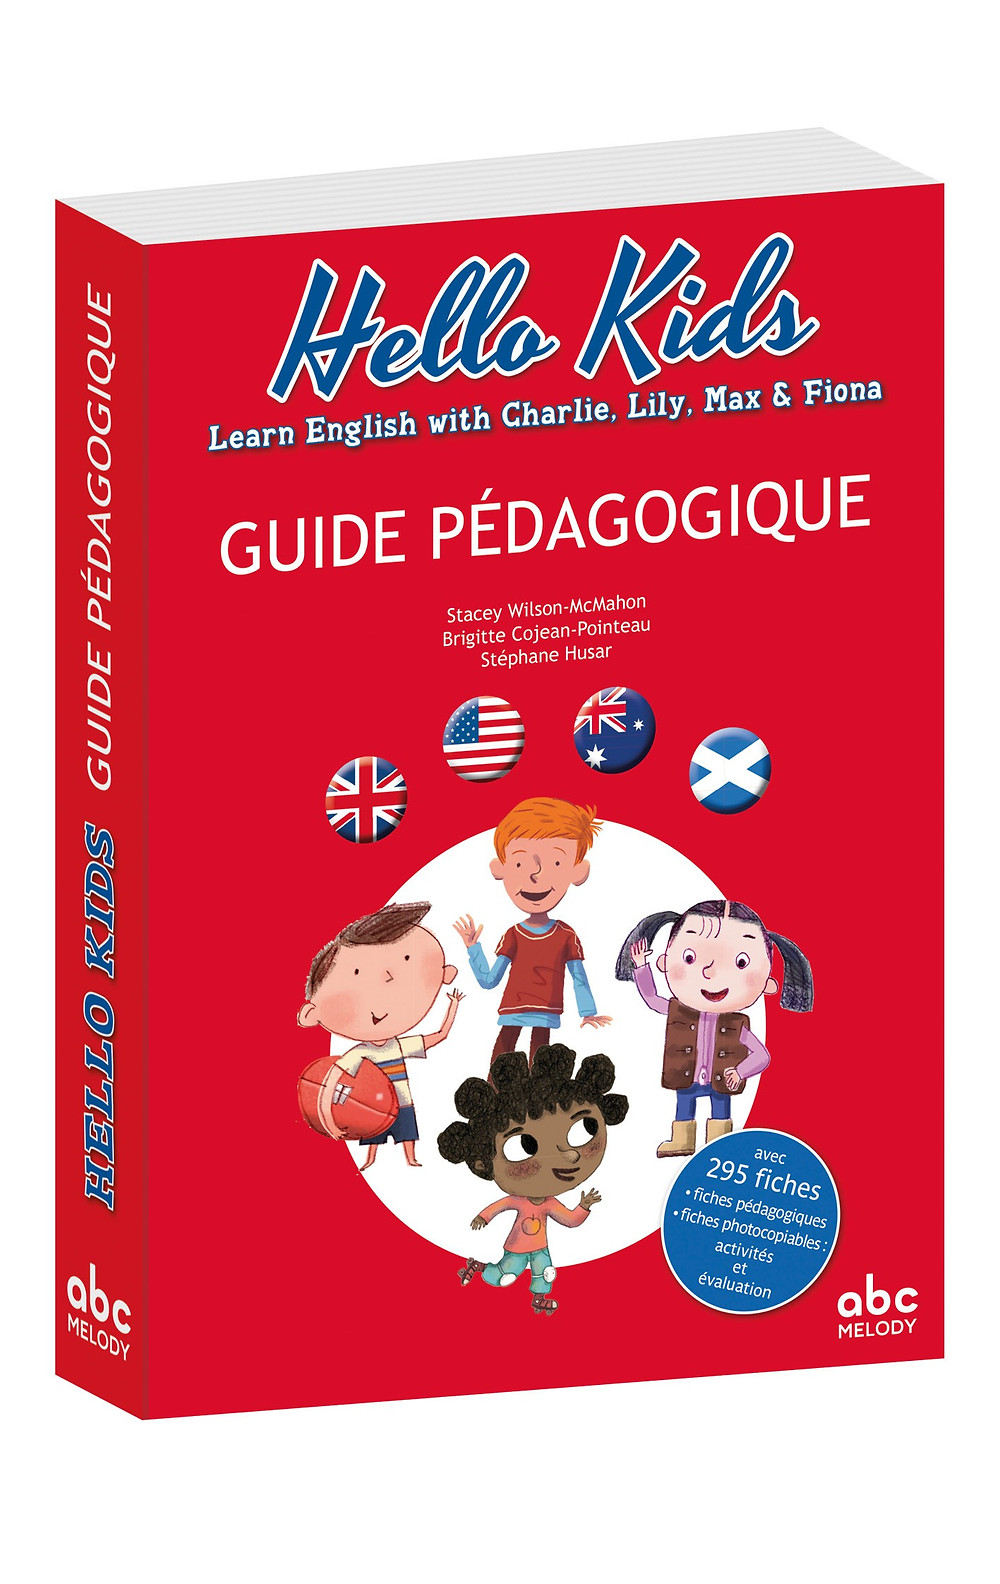 Hello Kids : Learn English with Charlie, Lili, Max & Fiona